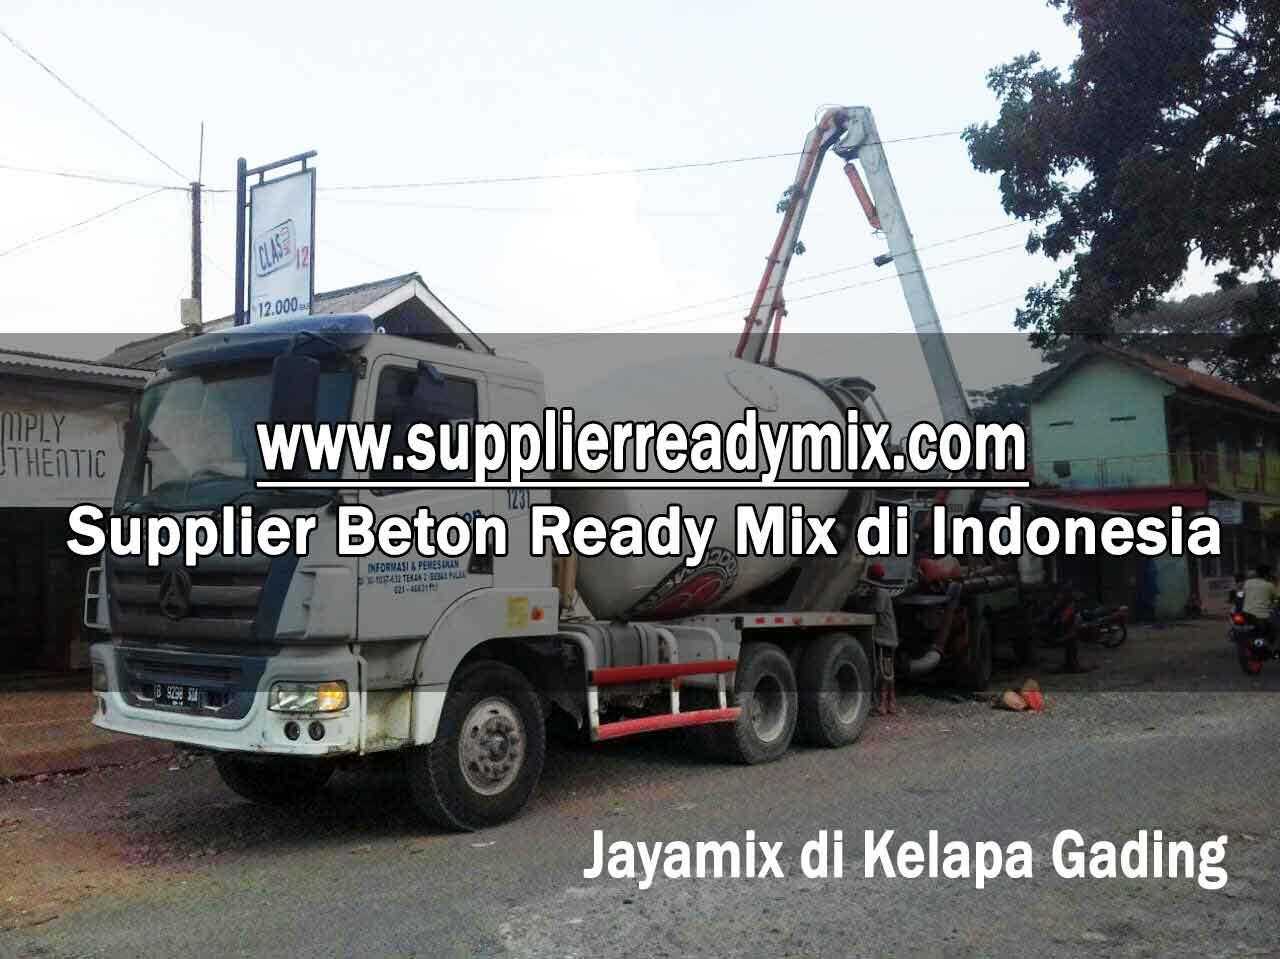 Harga Cor Beton Jayamix Kelapa Gading Per M3 2021